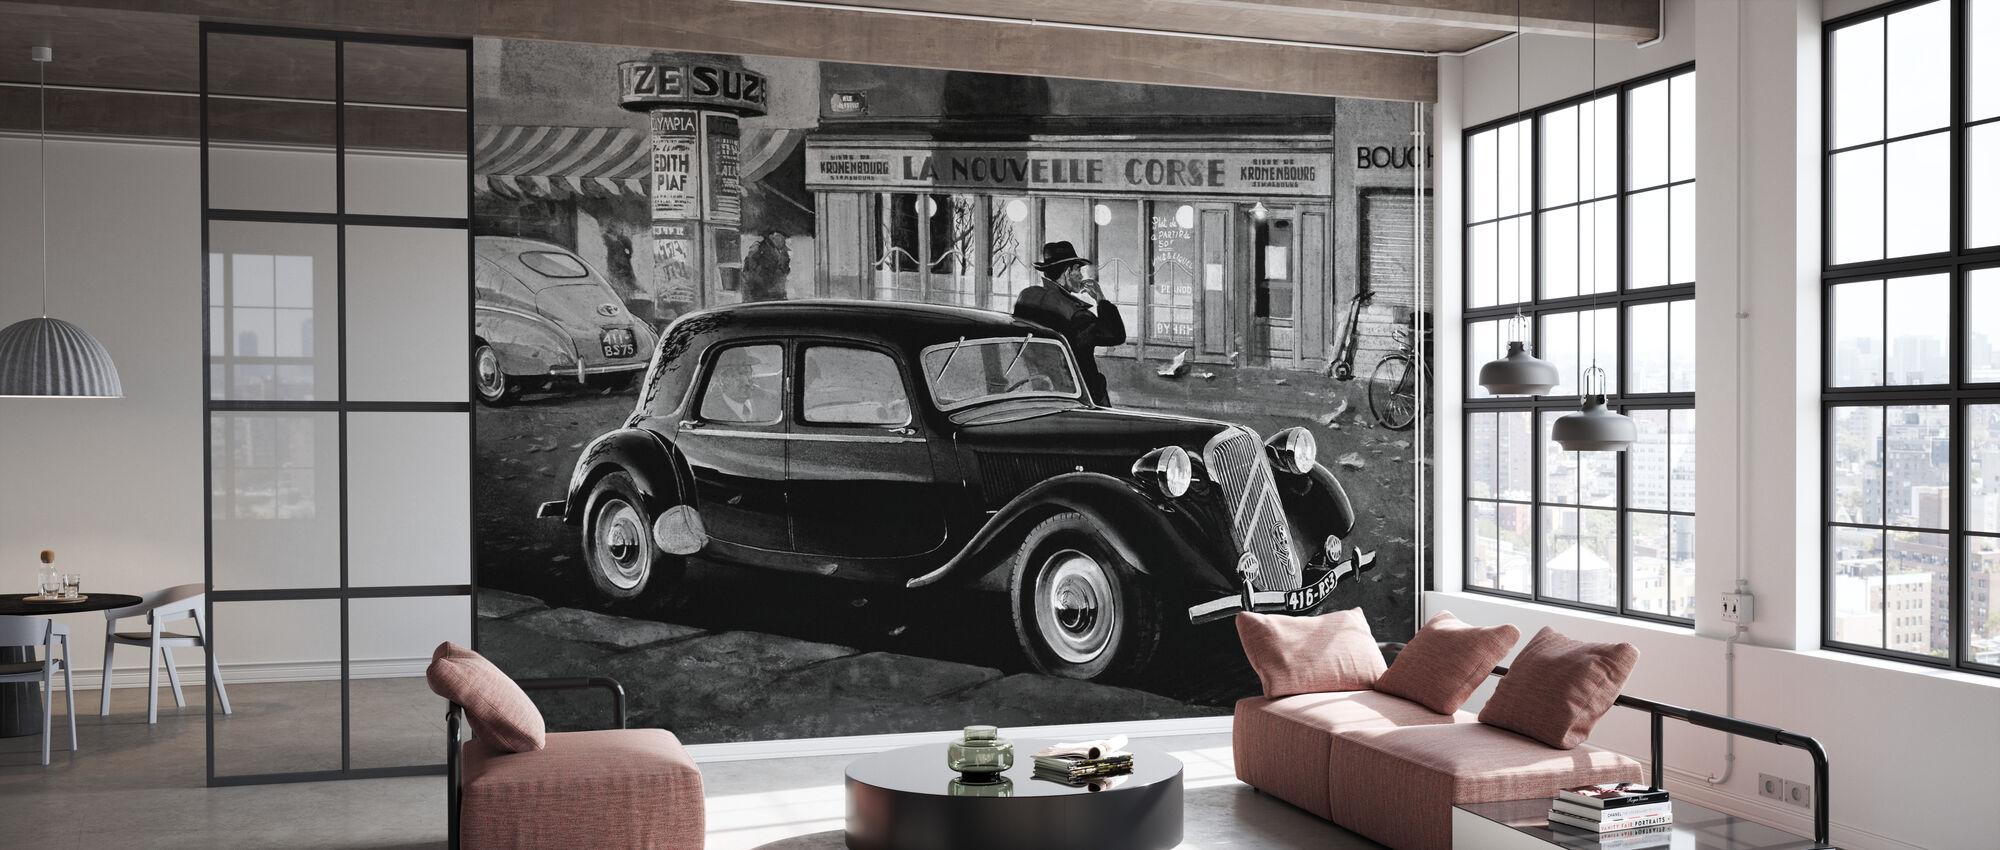 B15 in Paris BW - Wallpaper - Office